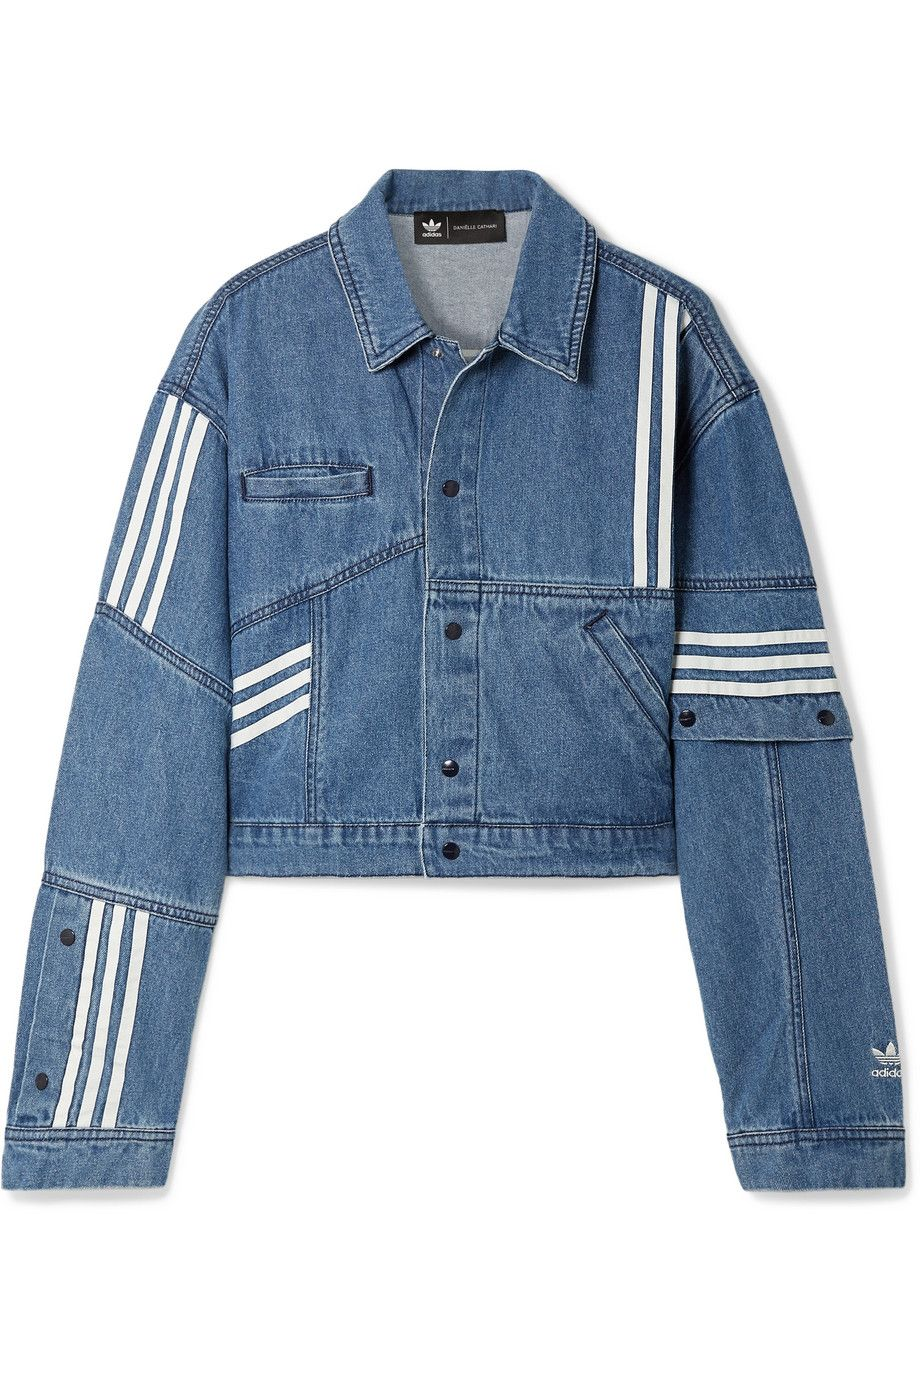 Adidas Originals Danielle Cathari Oversized Snap Embellished Patchwork Denim Jacket Net A Porter Com Kiyafet [ 1380 x 920 Pixel ]